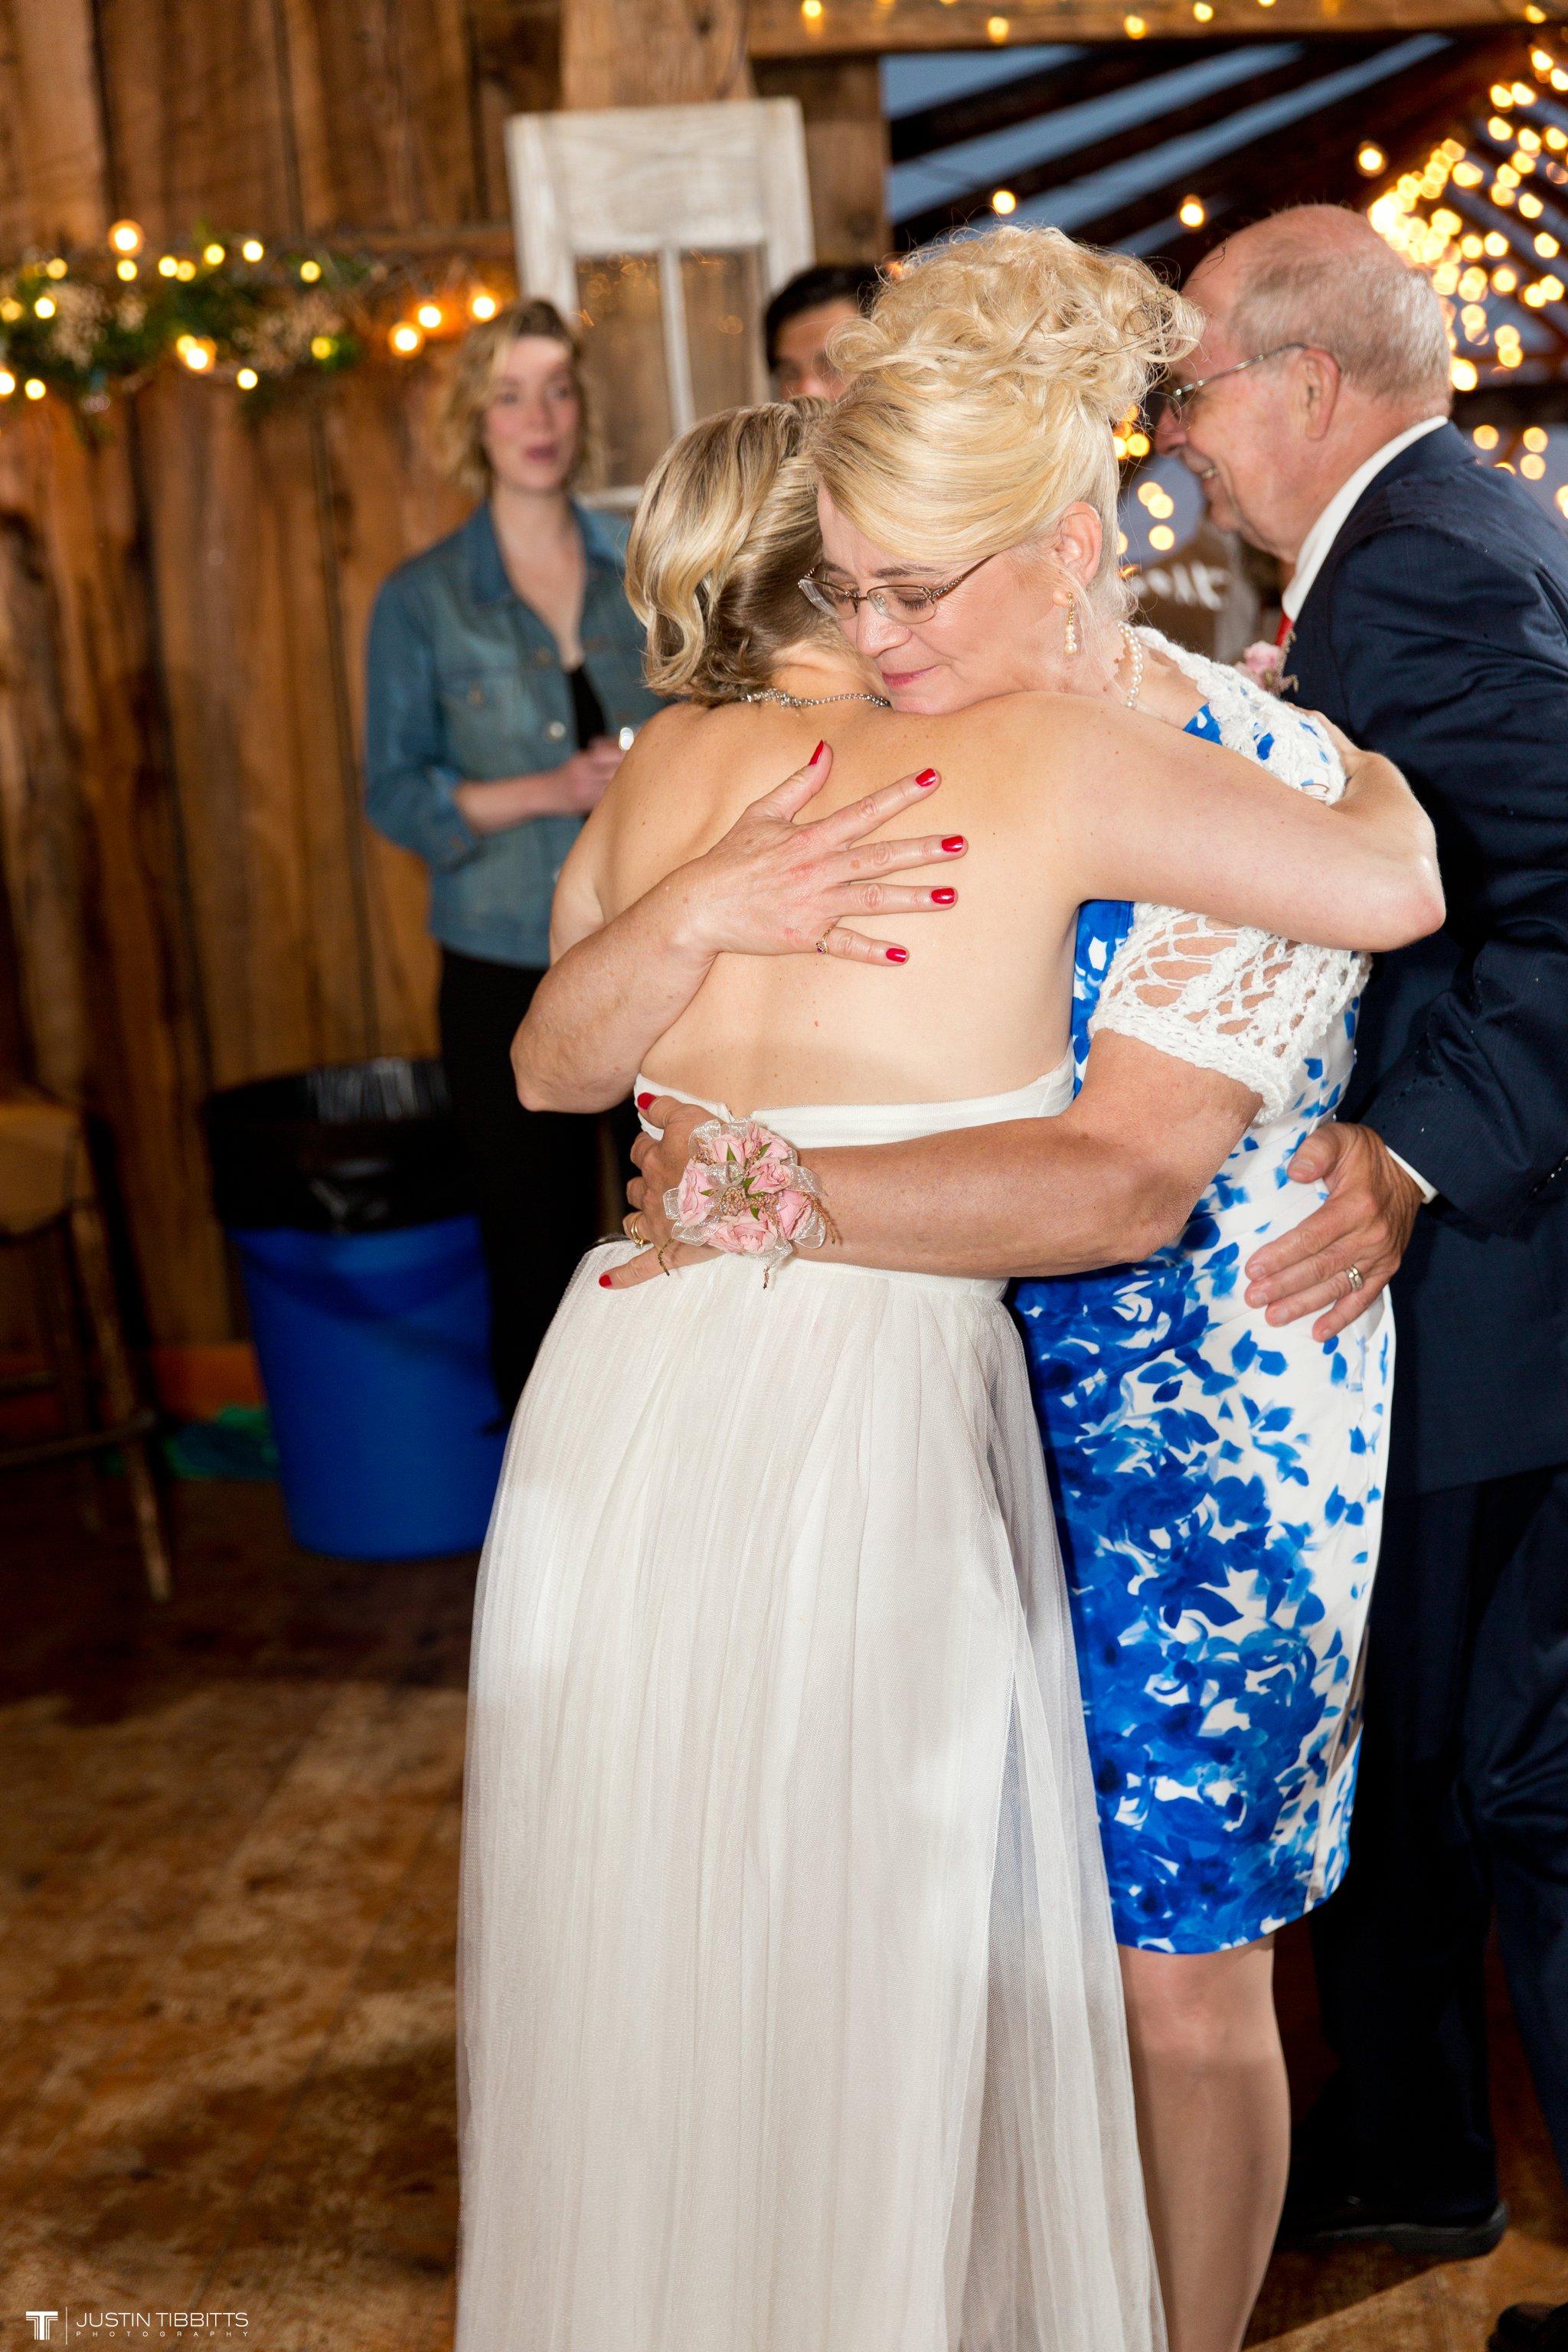 burlap-and-beams-wedding-photos-with-joran-and-molly_0113